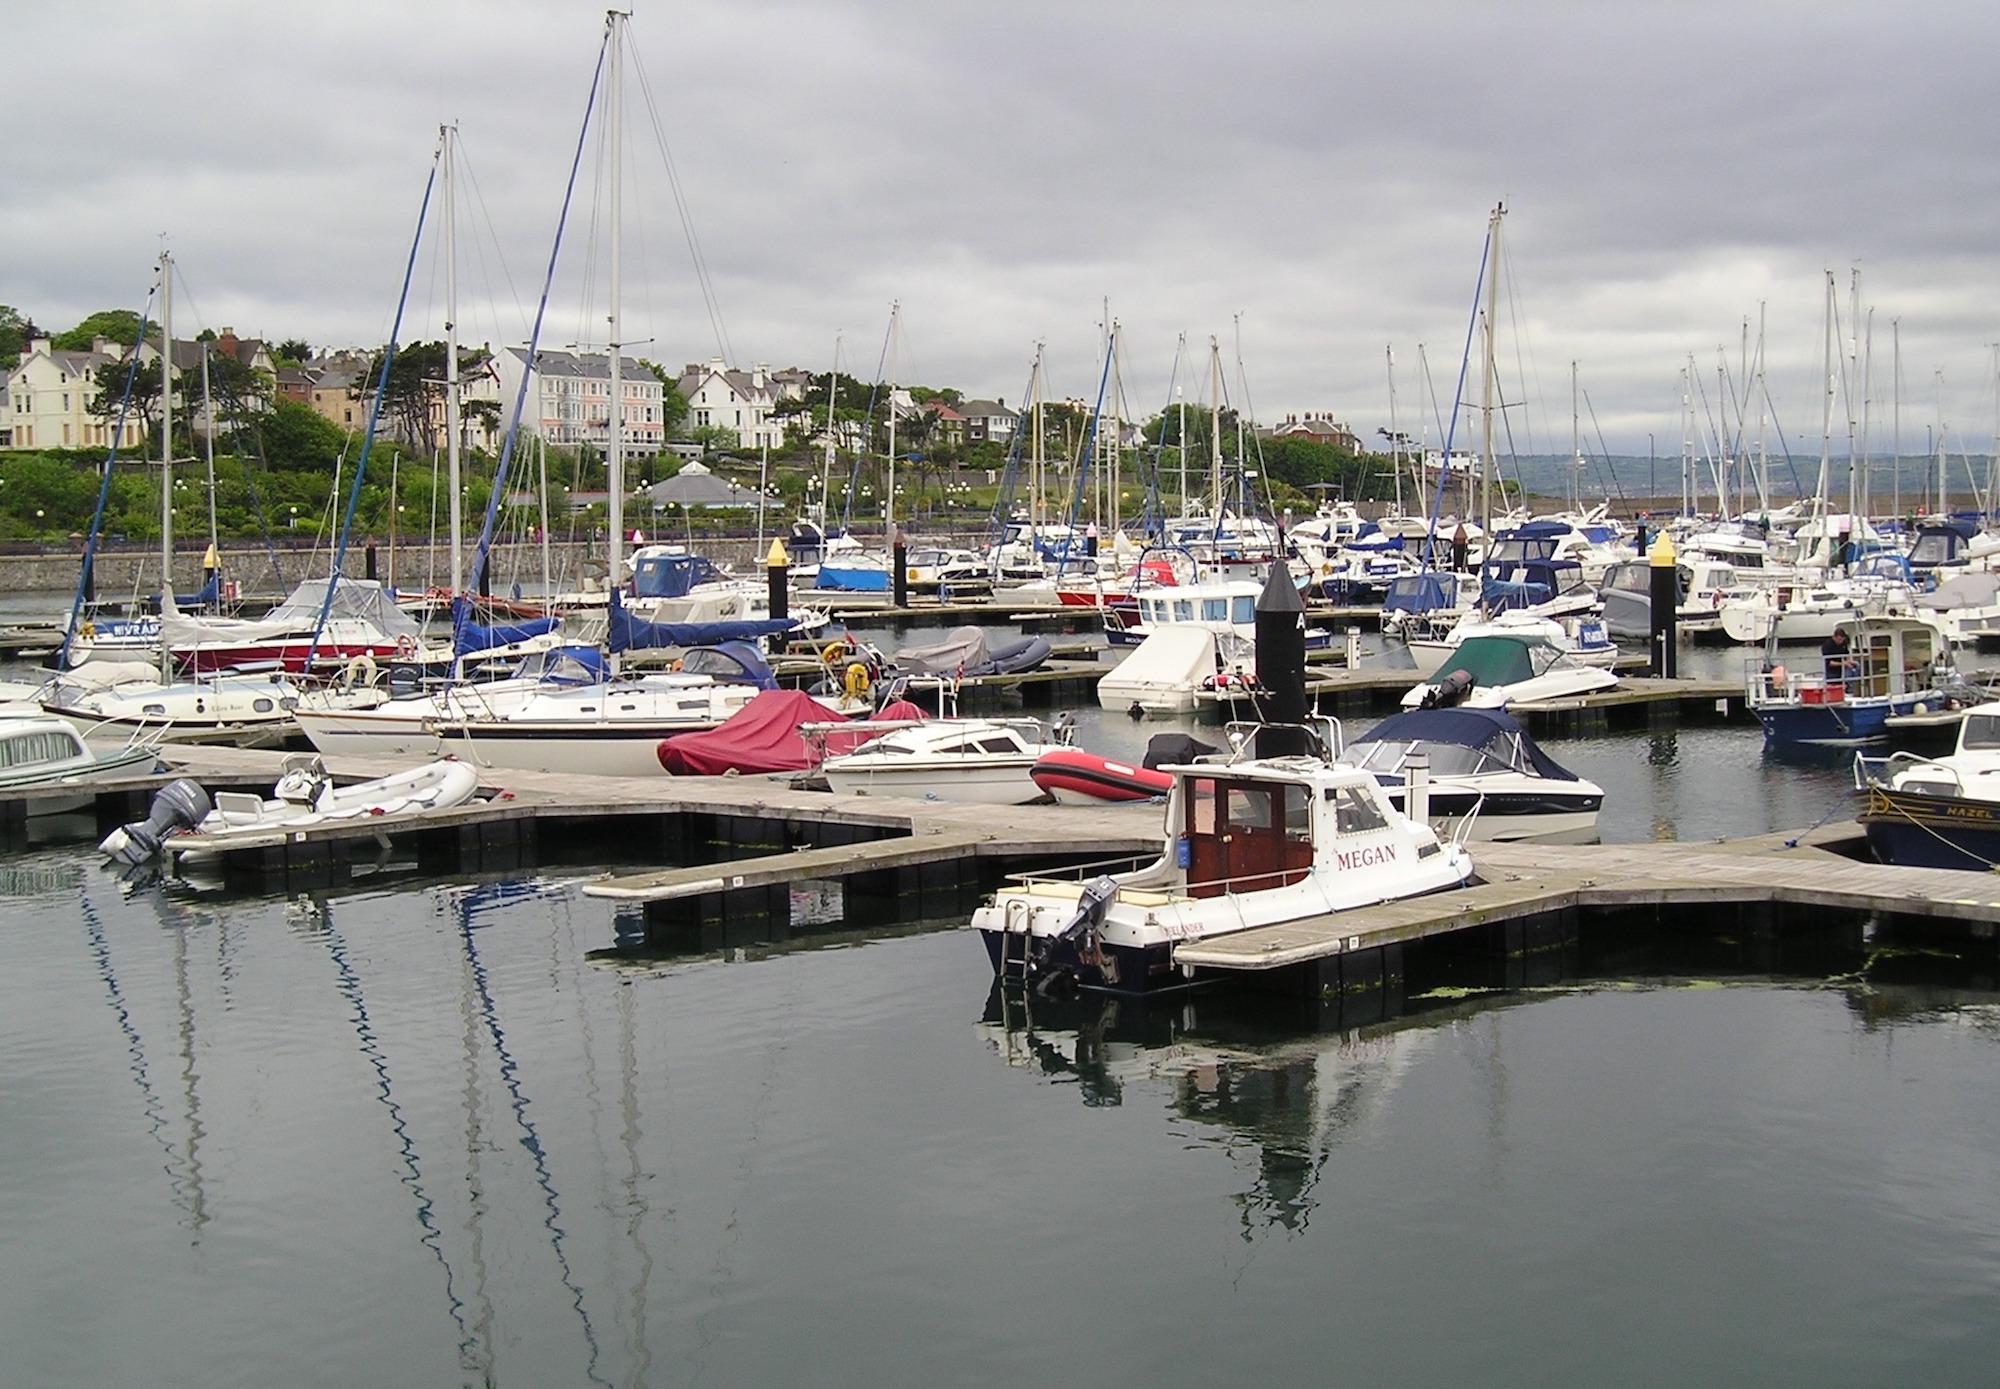 Bangor Camping | Campsites in Bangor, North Wales